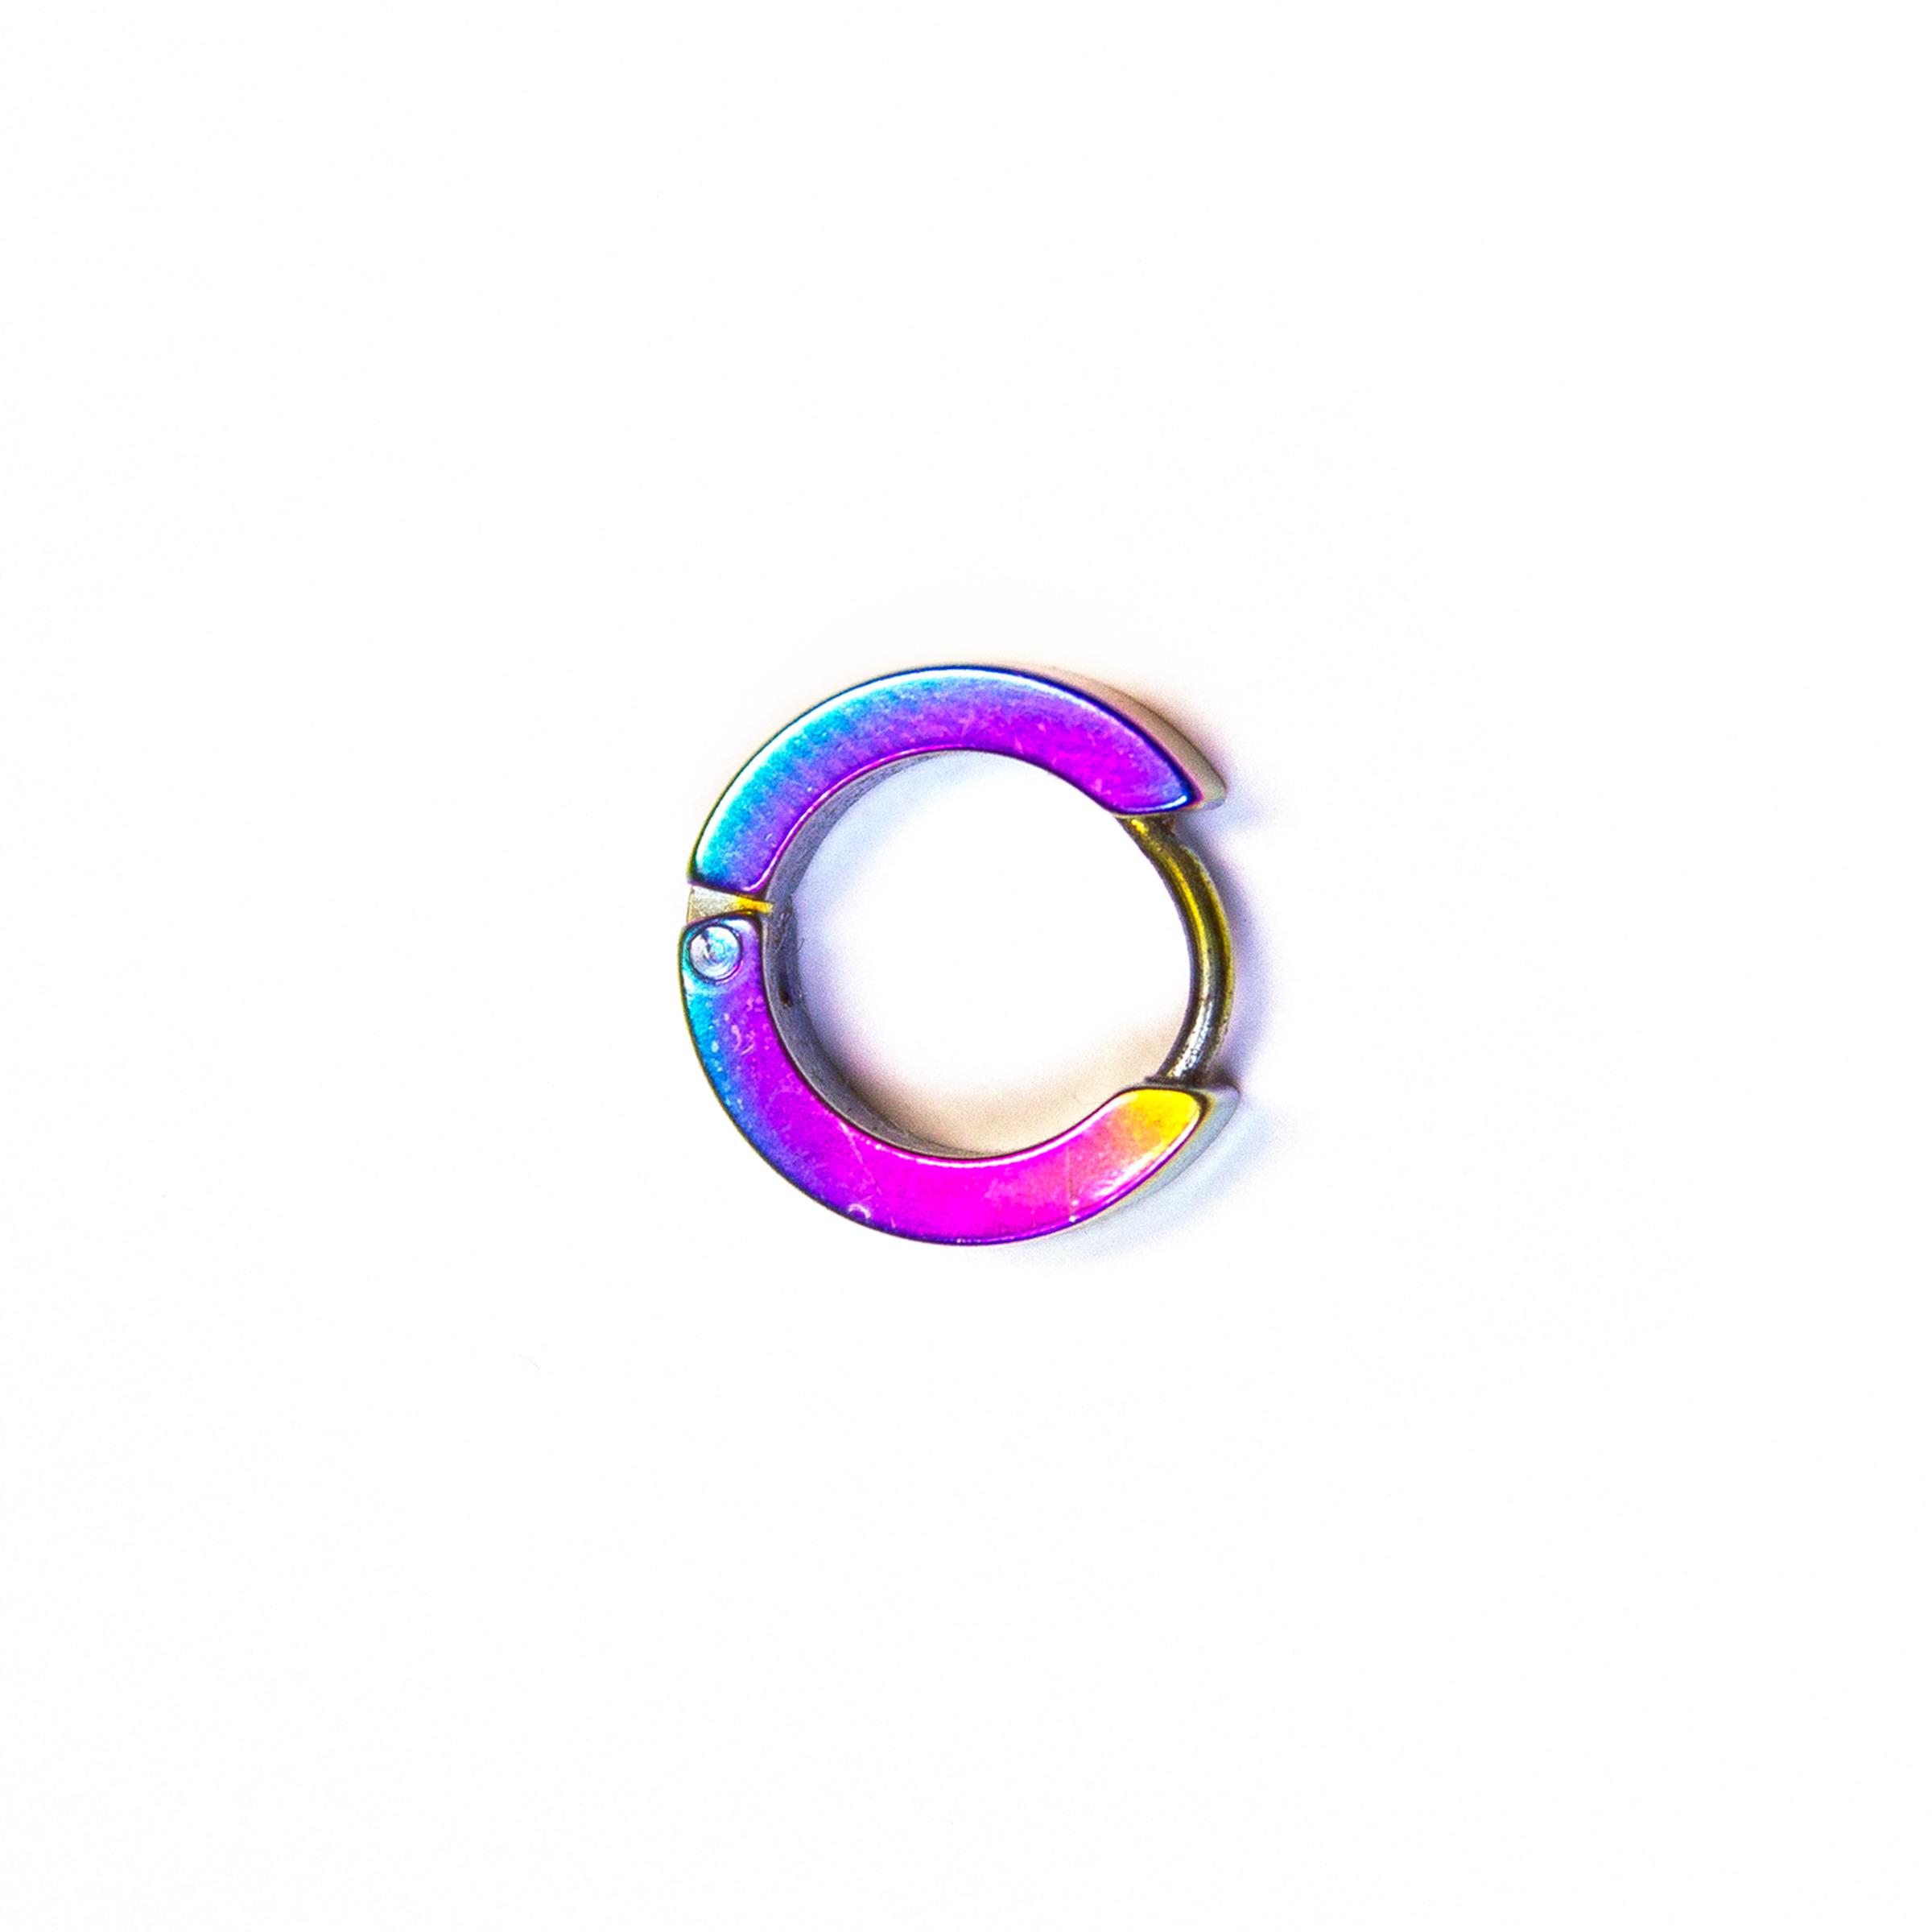 SCIFI009